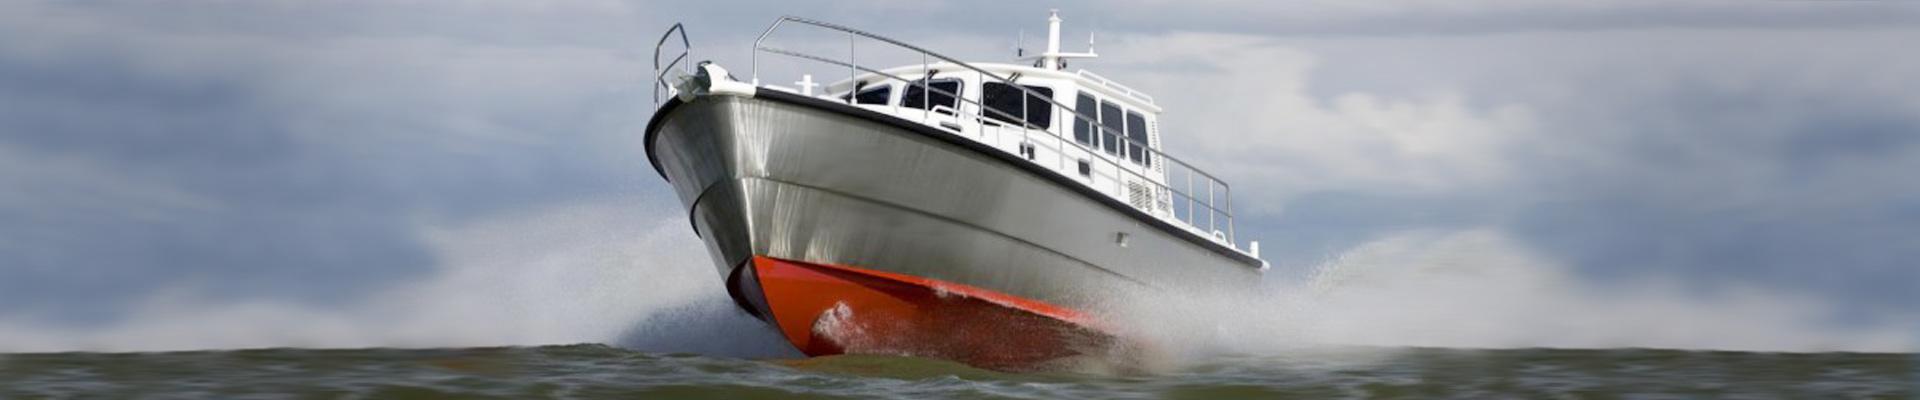 k-1150-offshore-harlingen